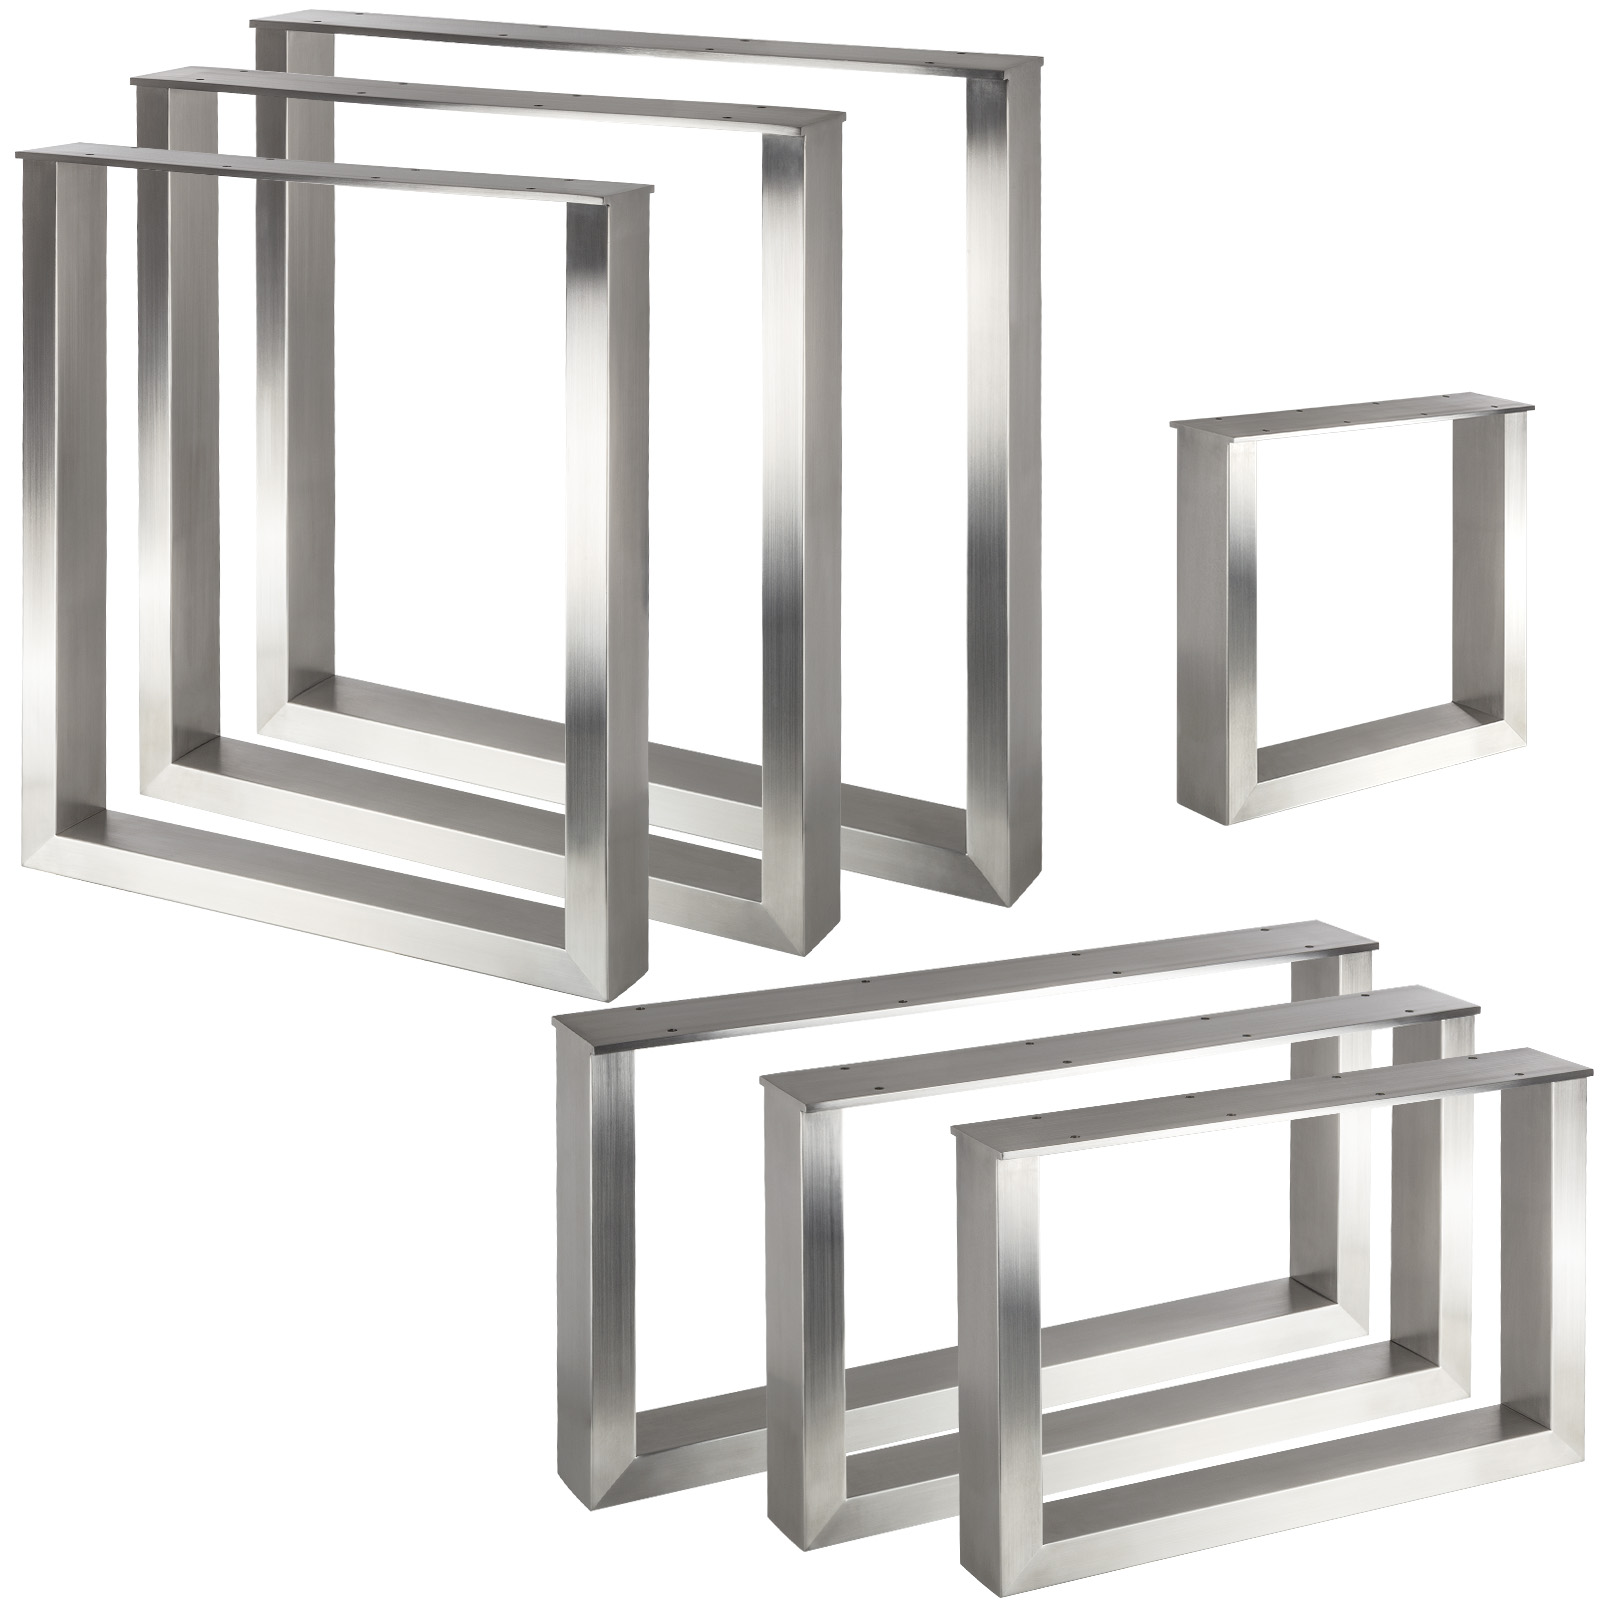 Möbelfuss Chrom matt Tischbein Höhe 710mm ø80mm Tischstempel Tischgestell Metall